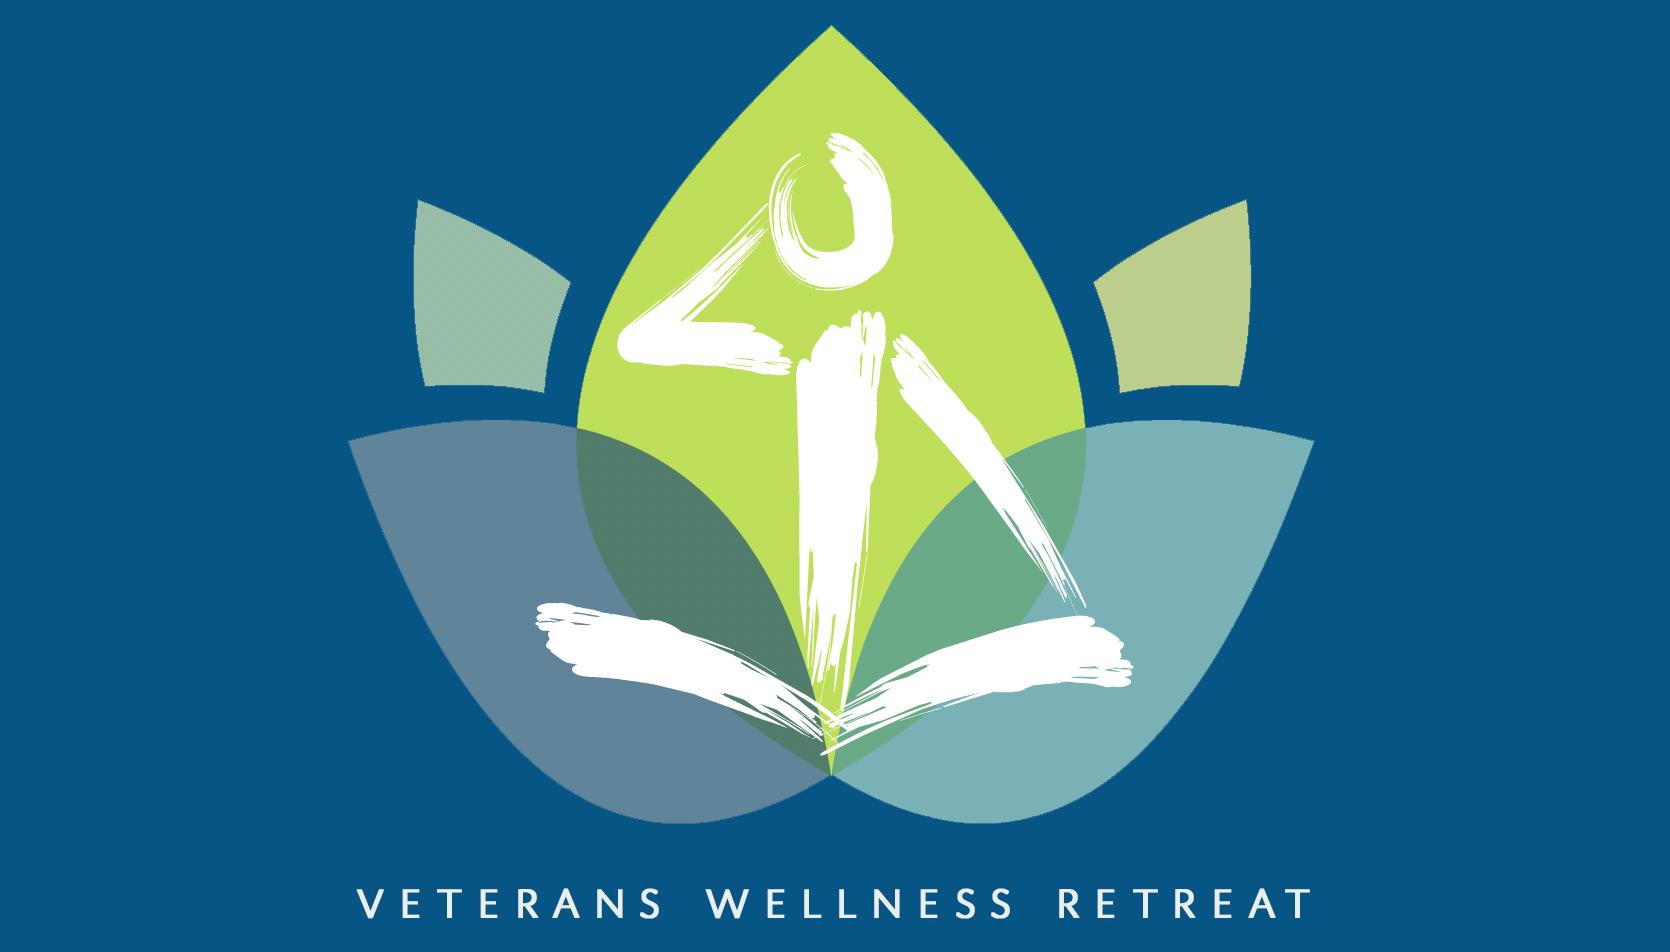 logo-veterans-wellness-retreat